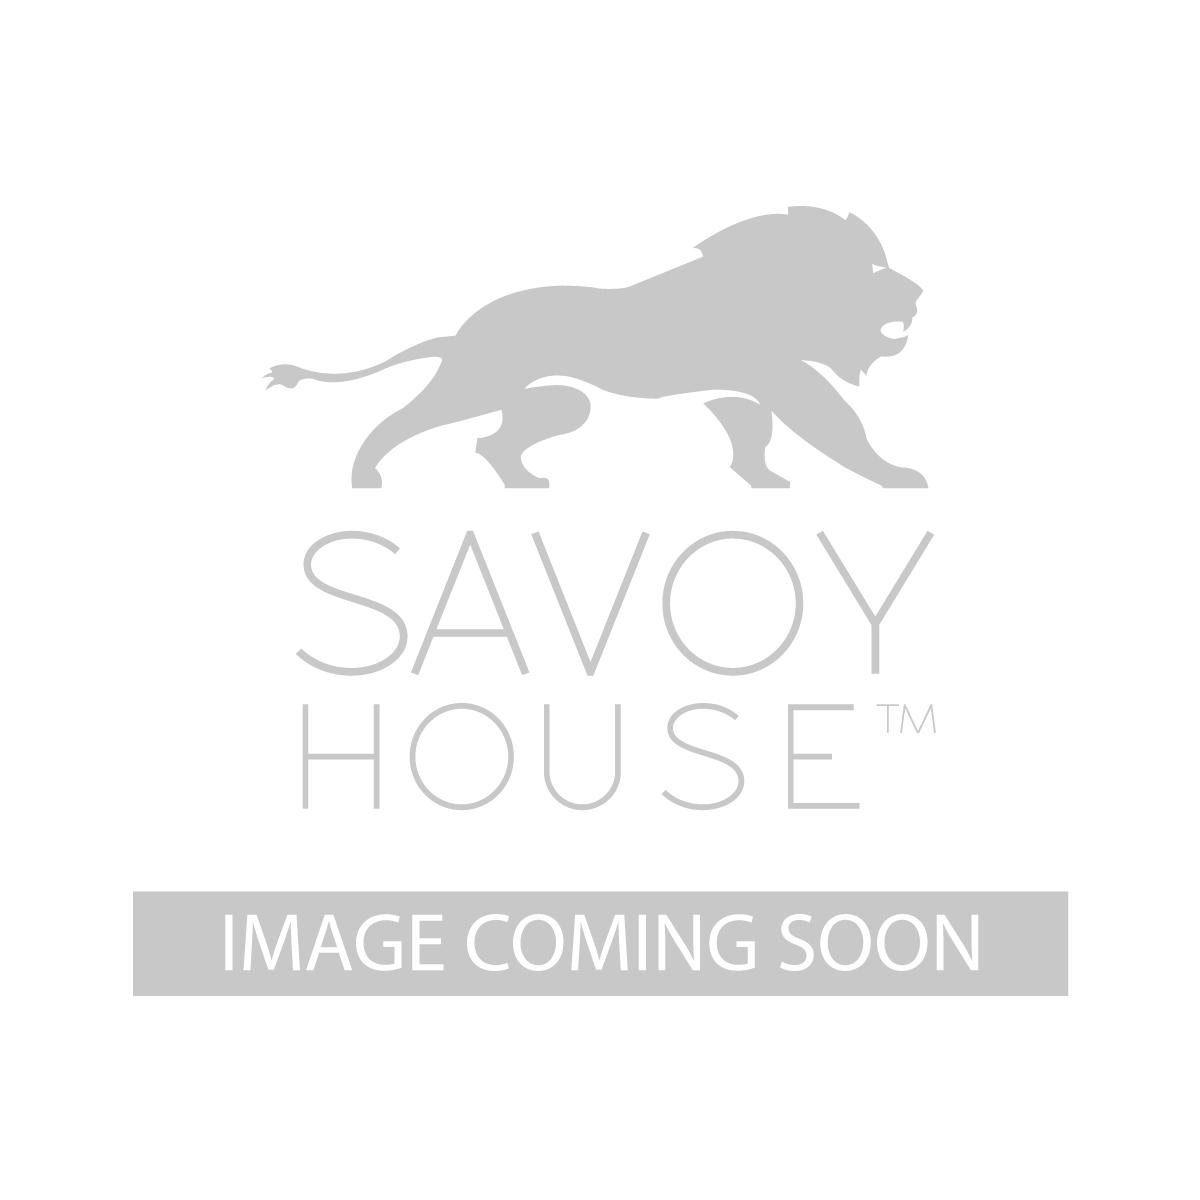 1 9060 6 95 Dunbar 6 Light Chandelier By Savoy House